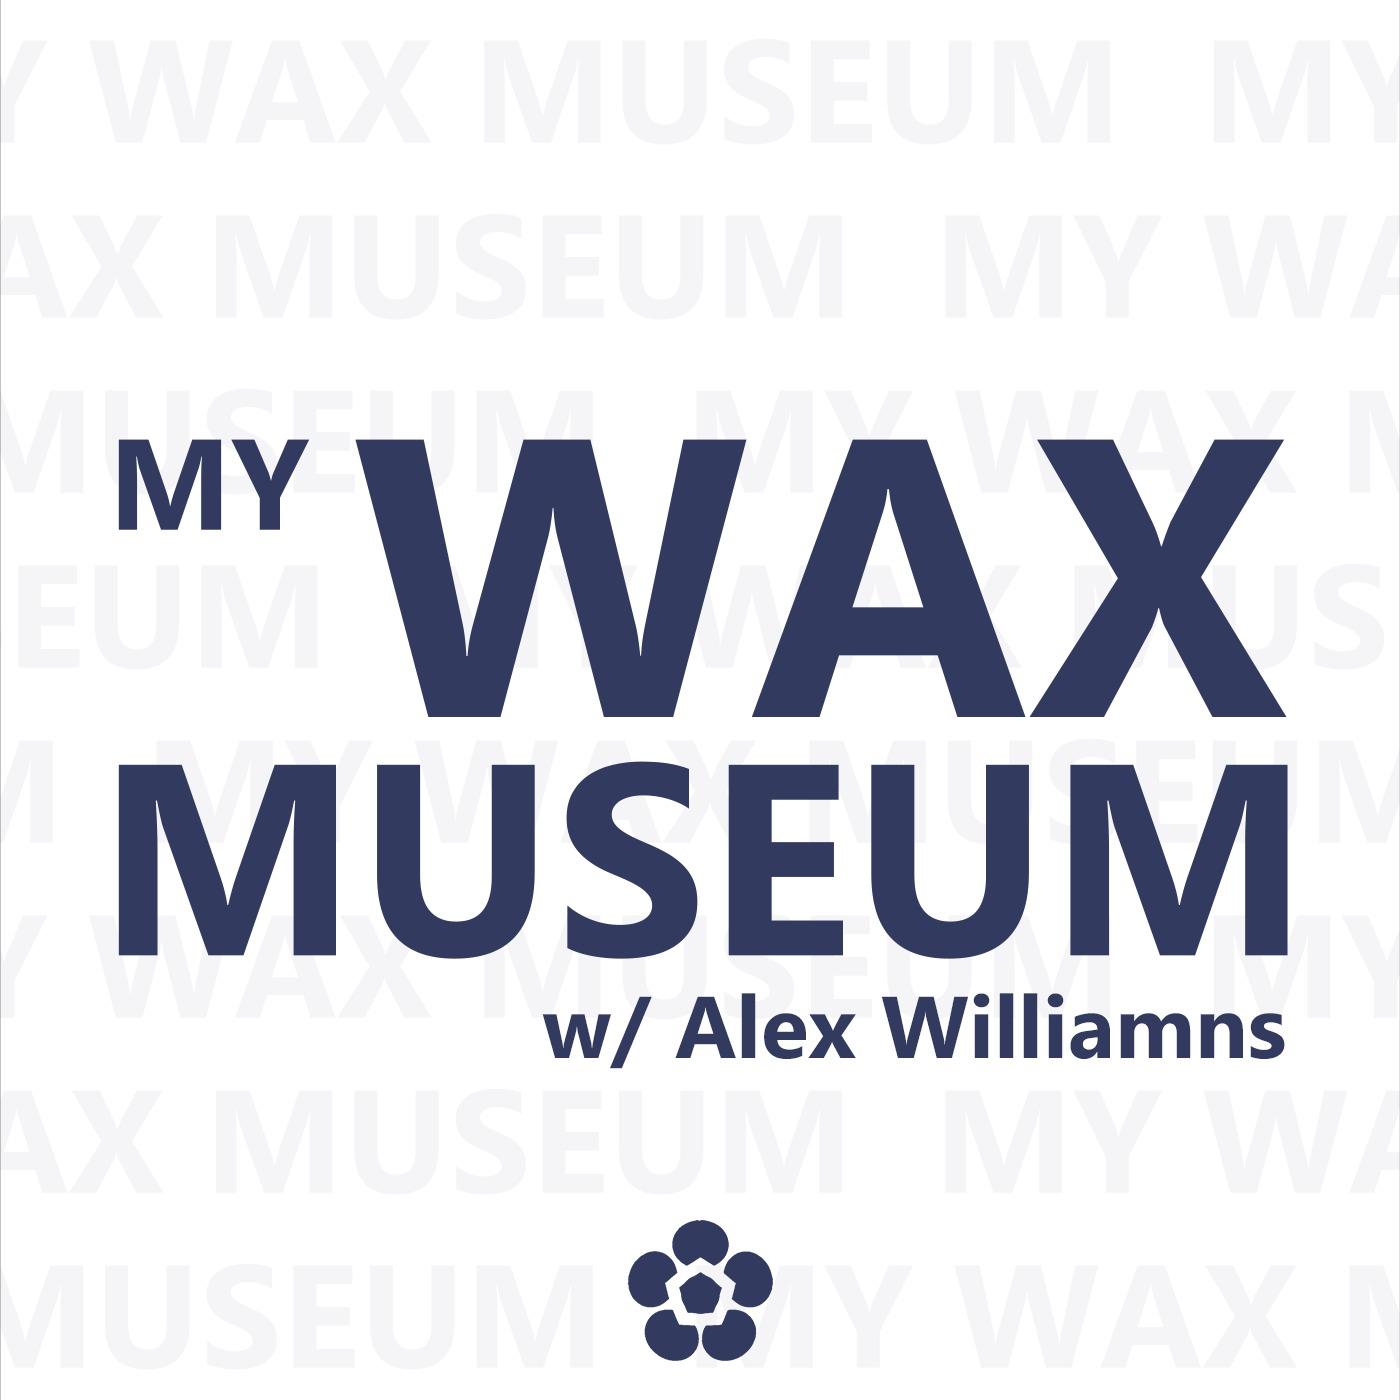 My Wax Museum